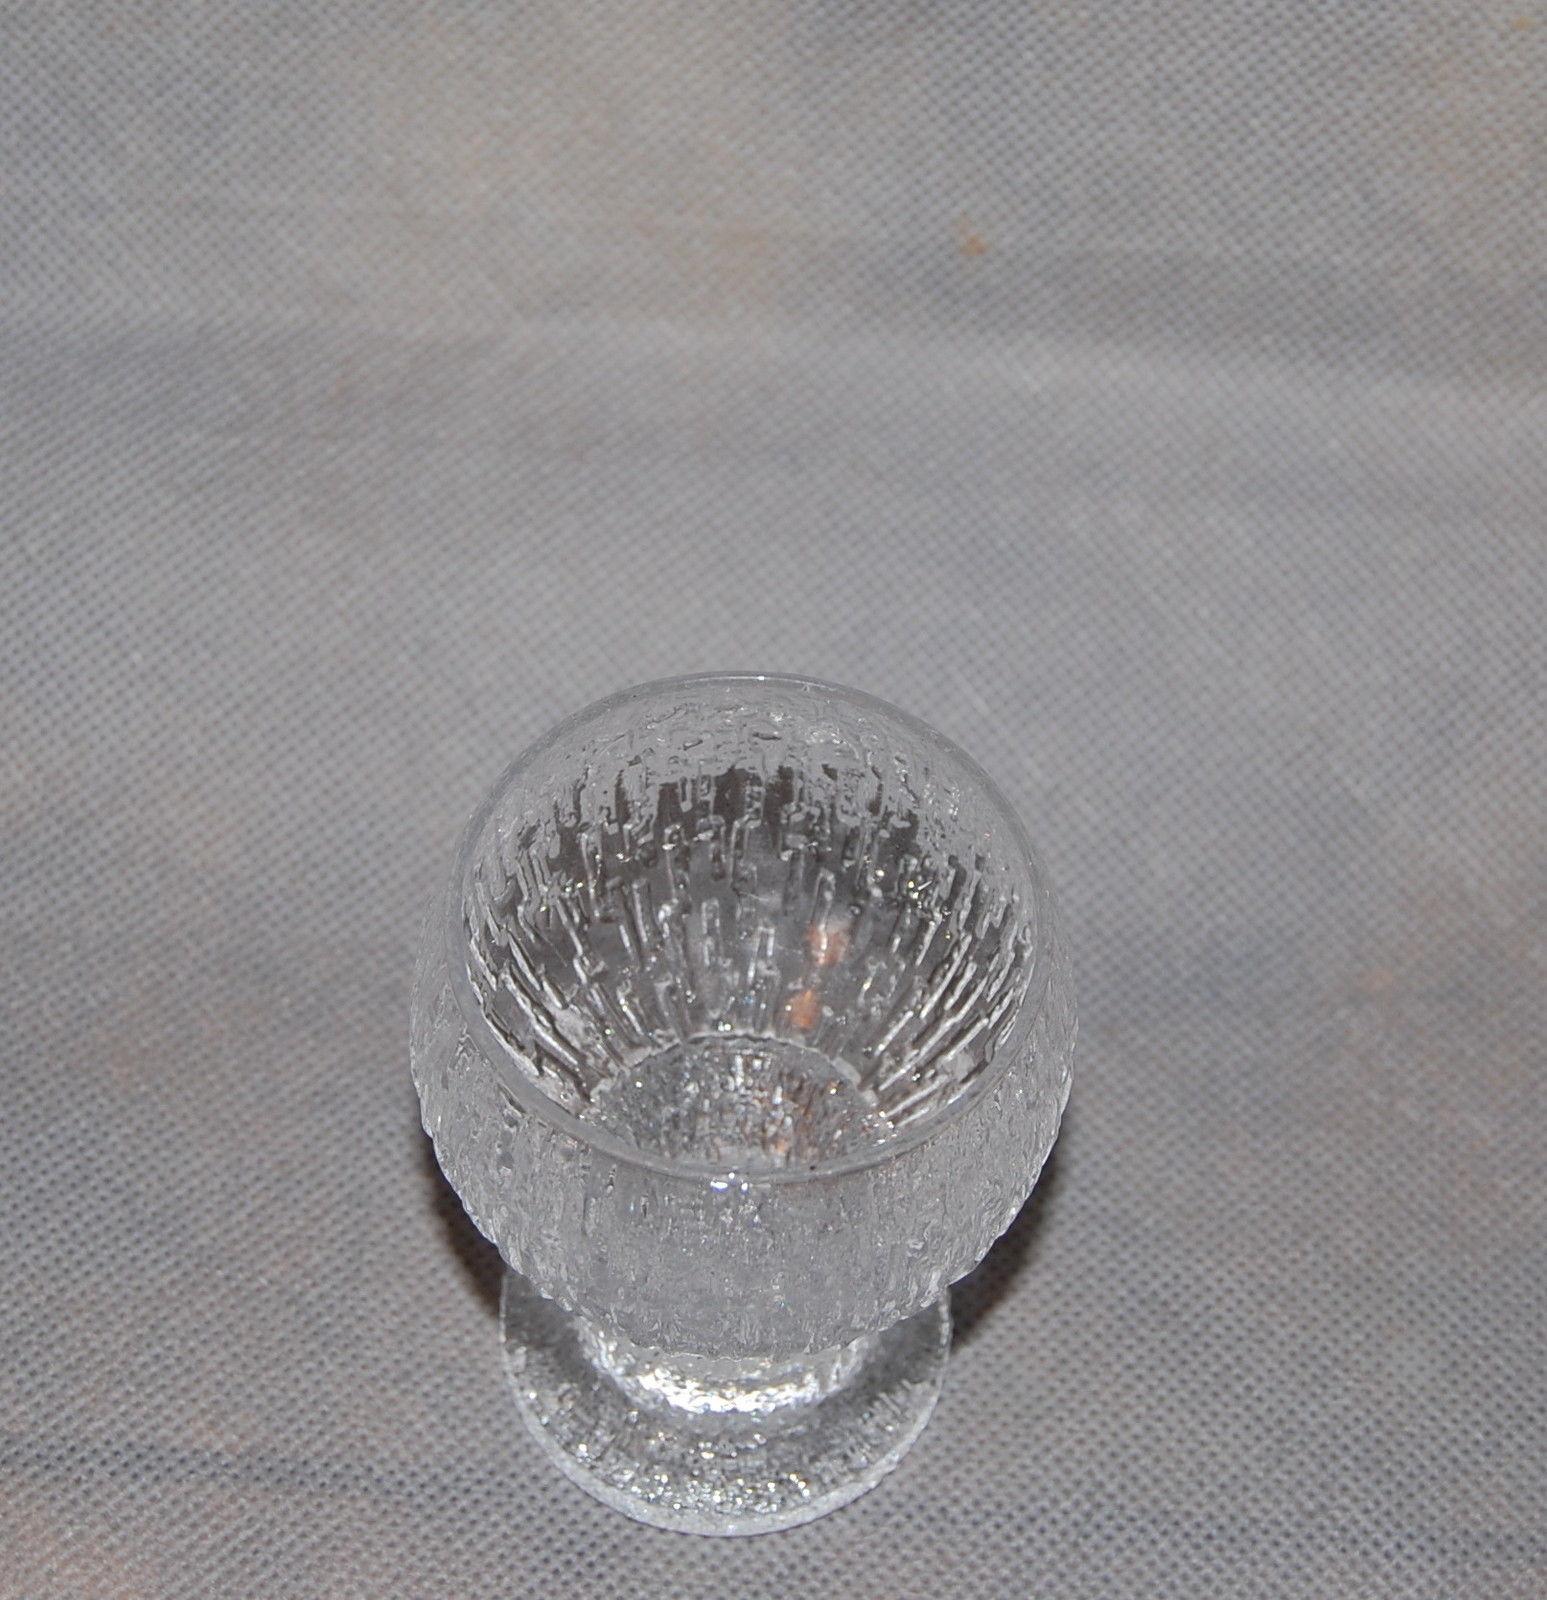 iittala finland kekkerit cocktail glass timo sarpaneva. Black Bedroom Furniture Sets. Home Design Ideas